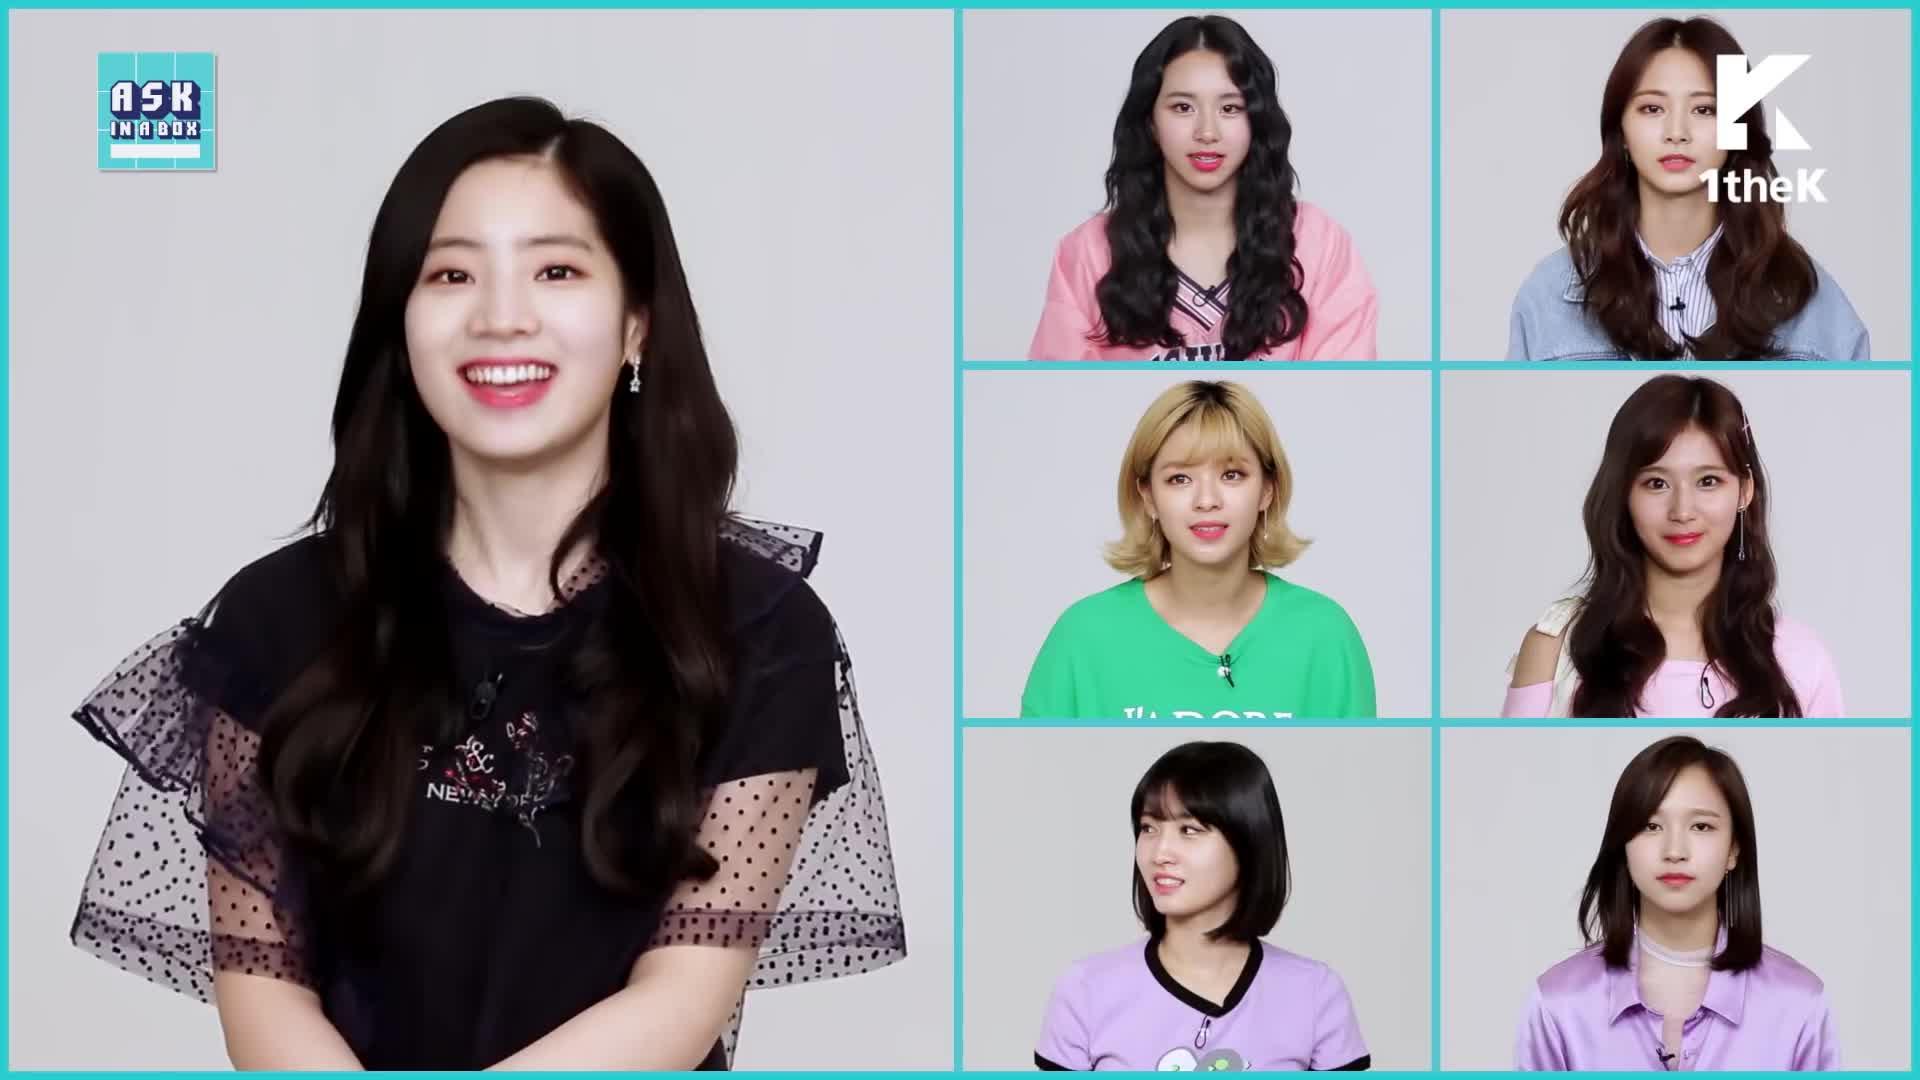 1theK, Kpop, MV, Teaser, dahyun, dubu, loen, sana, twice, 로엔, 뮤비, 신곡, 원더케이, 티져, Dahyun TWICE(트와이스) _ What is Love? GIFs